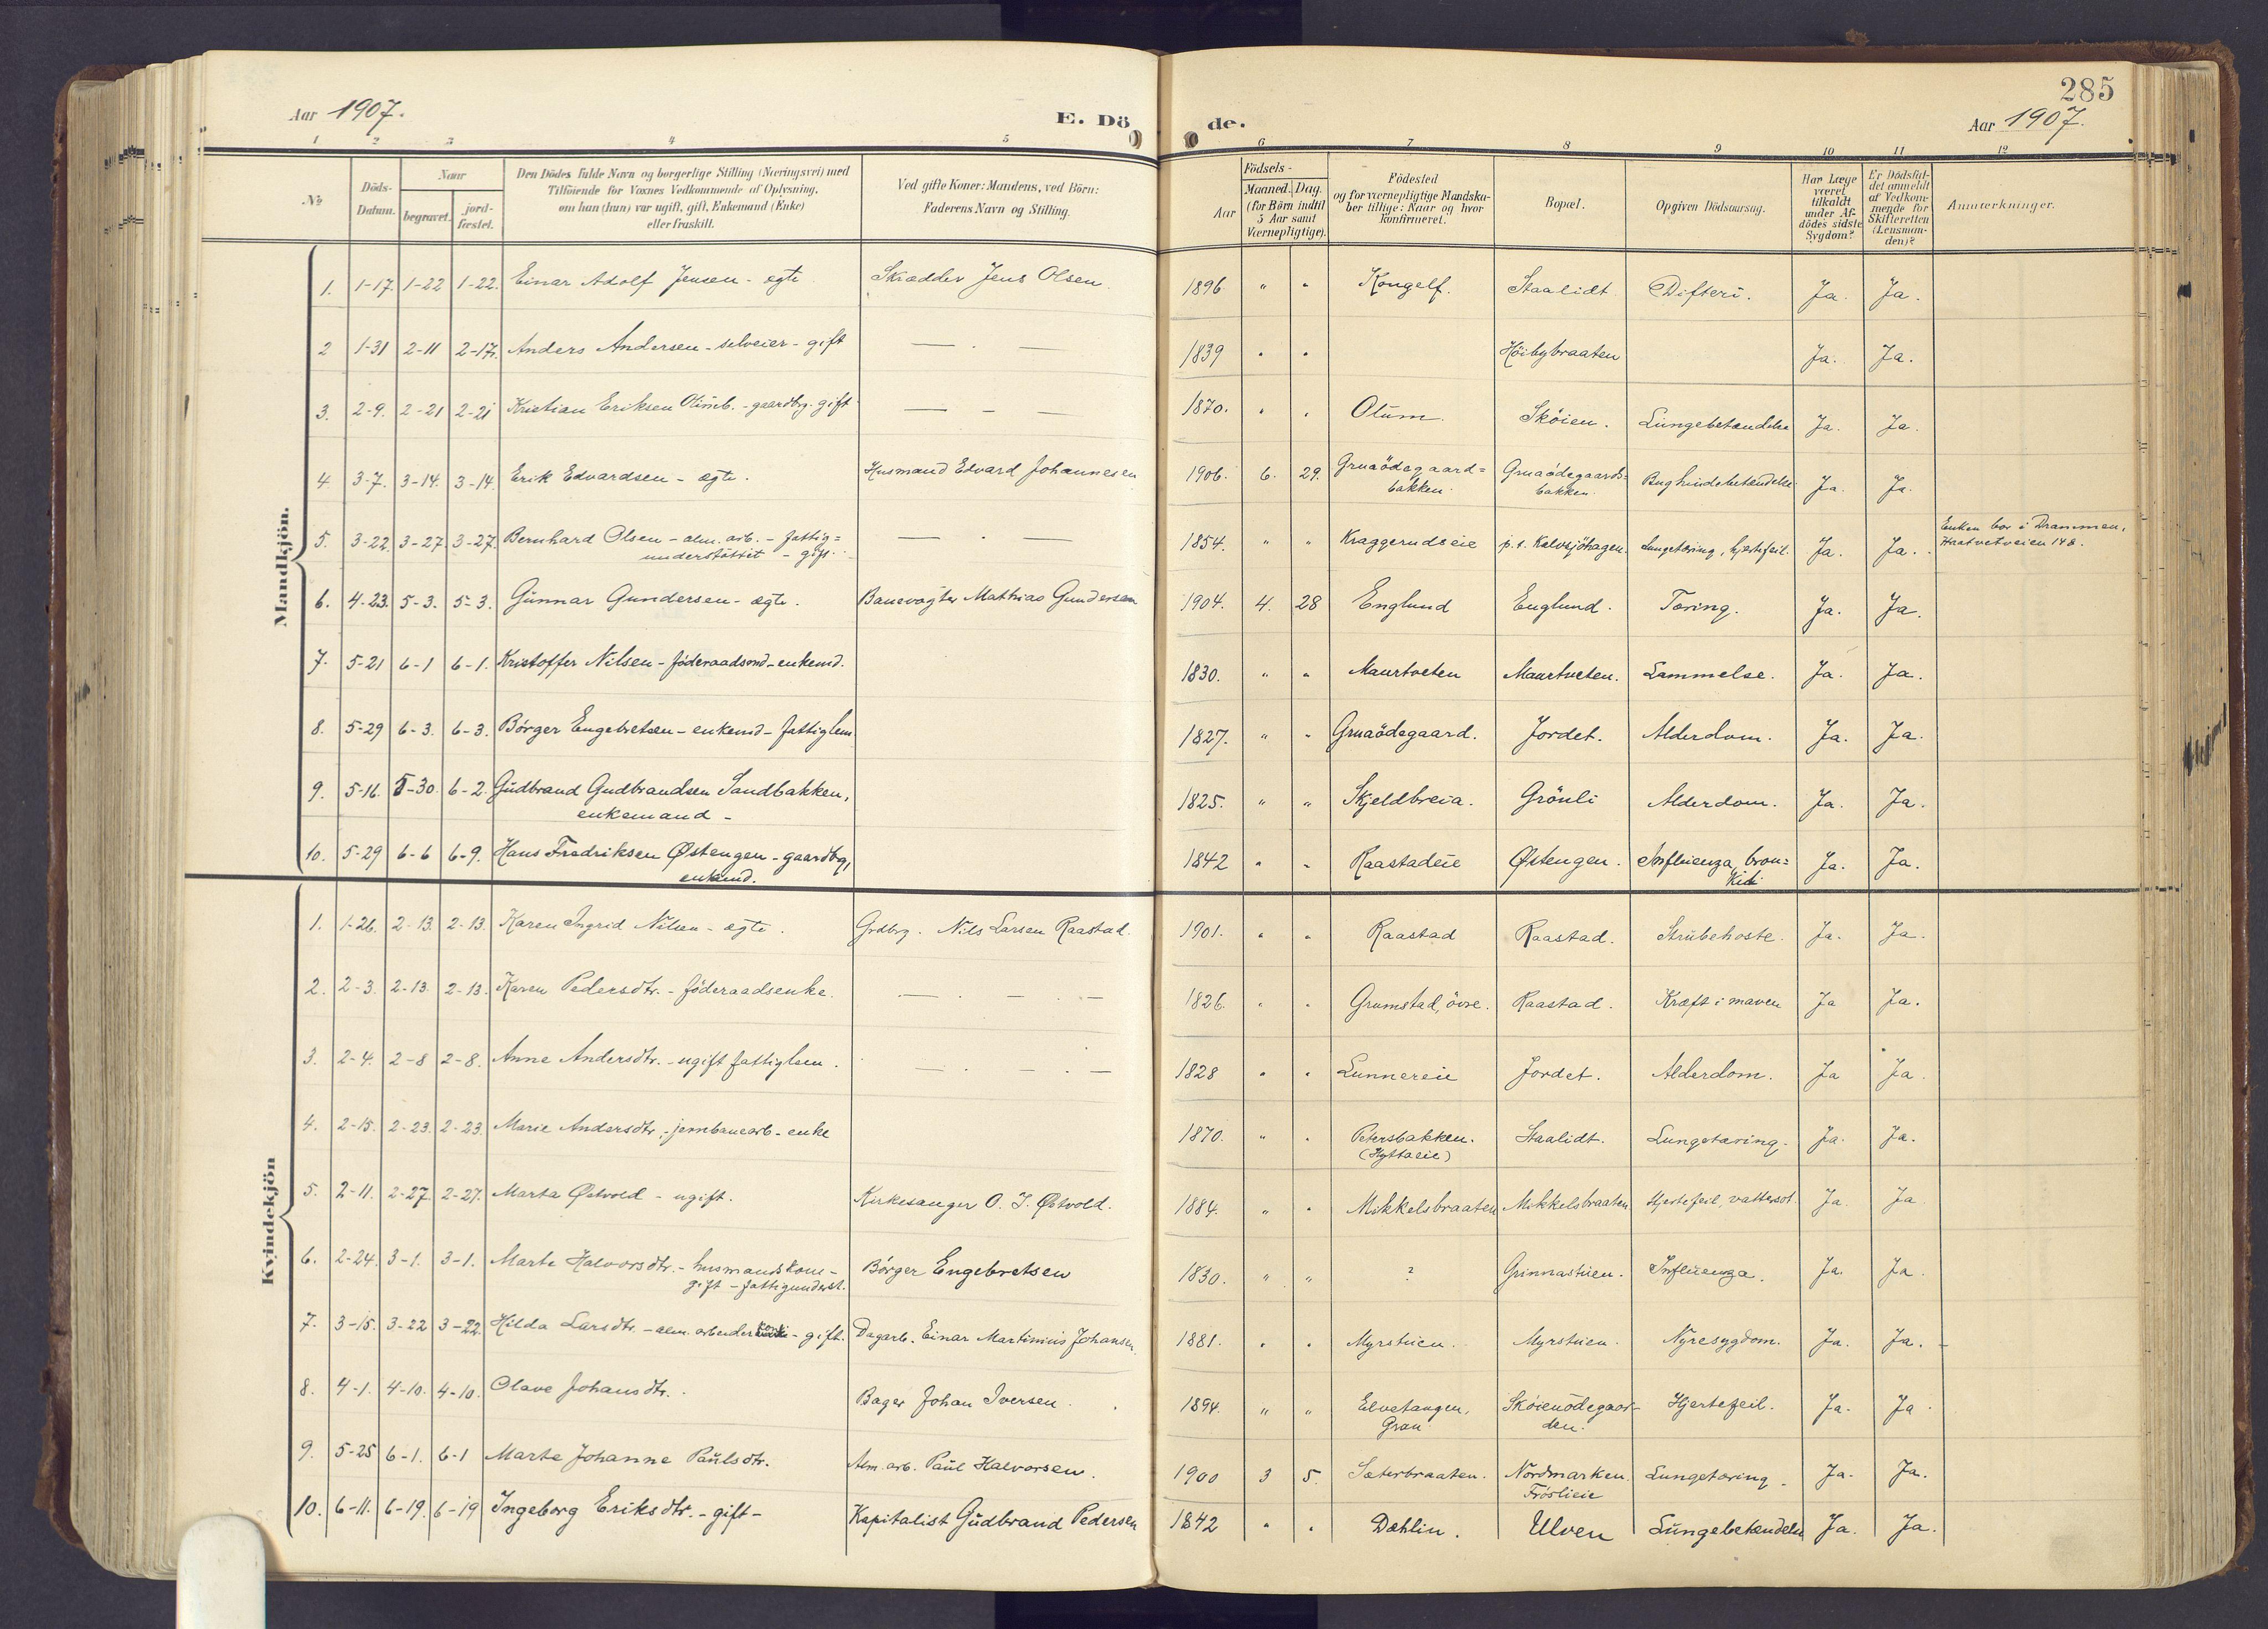 SAH, Lunner prestekontor, H/Ha/Haa/L0001: Ministerialbok nr. 1, 1907-1922, s. 285